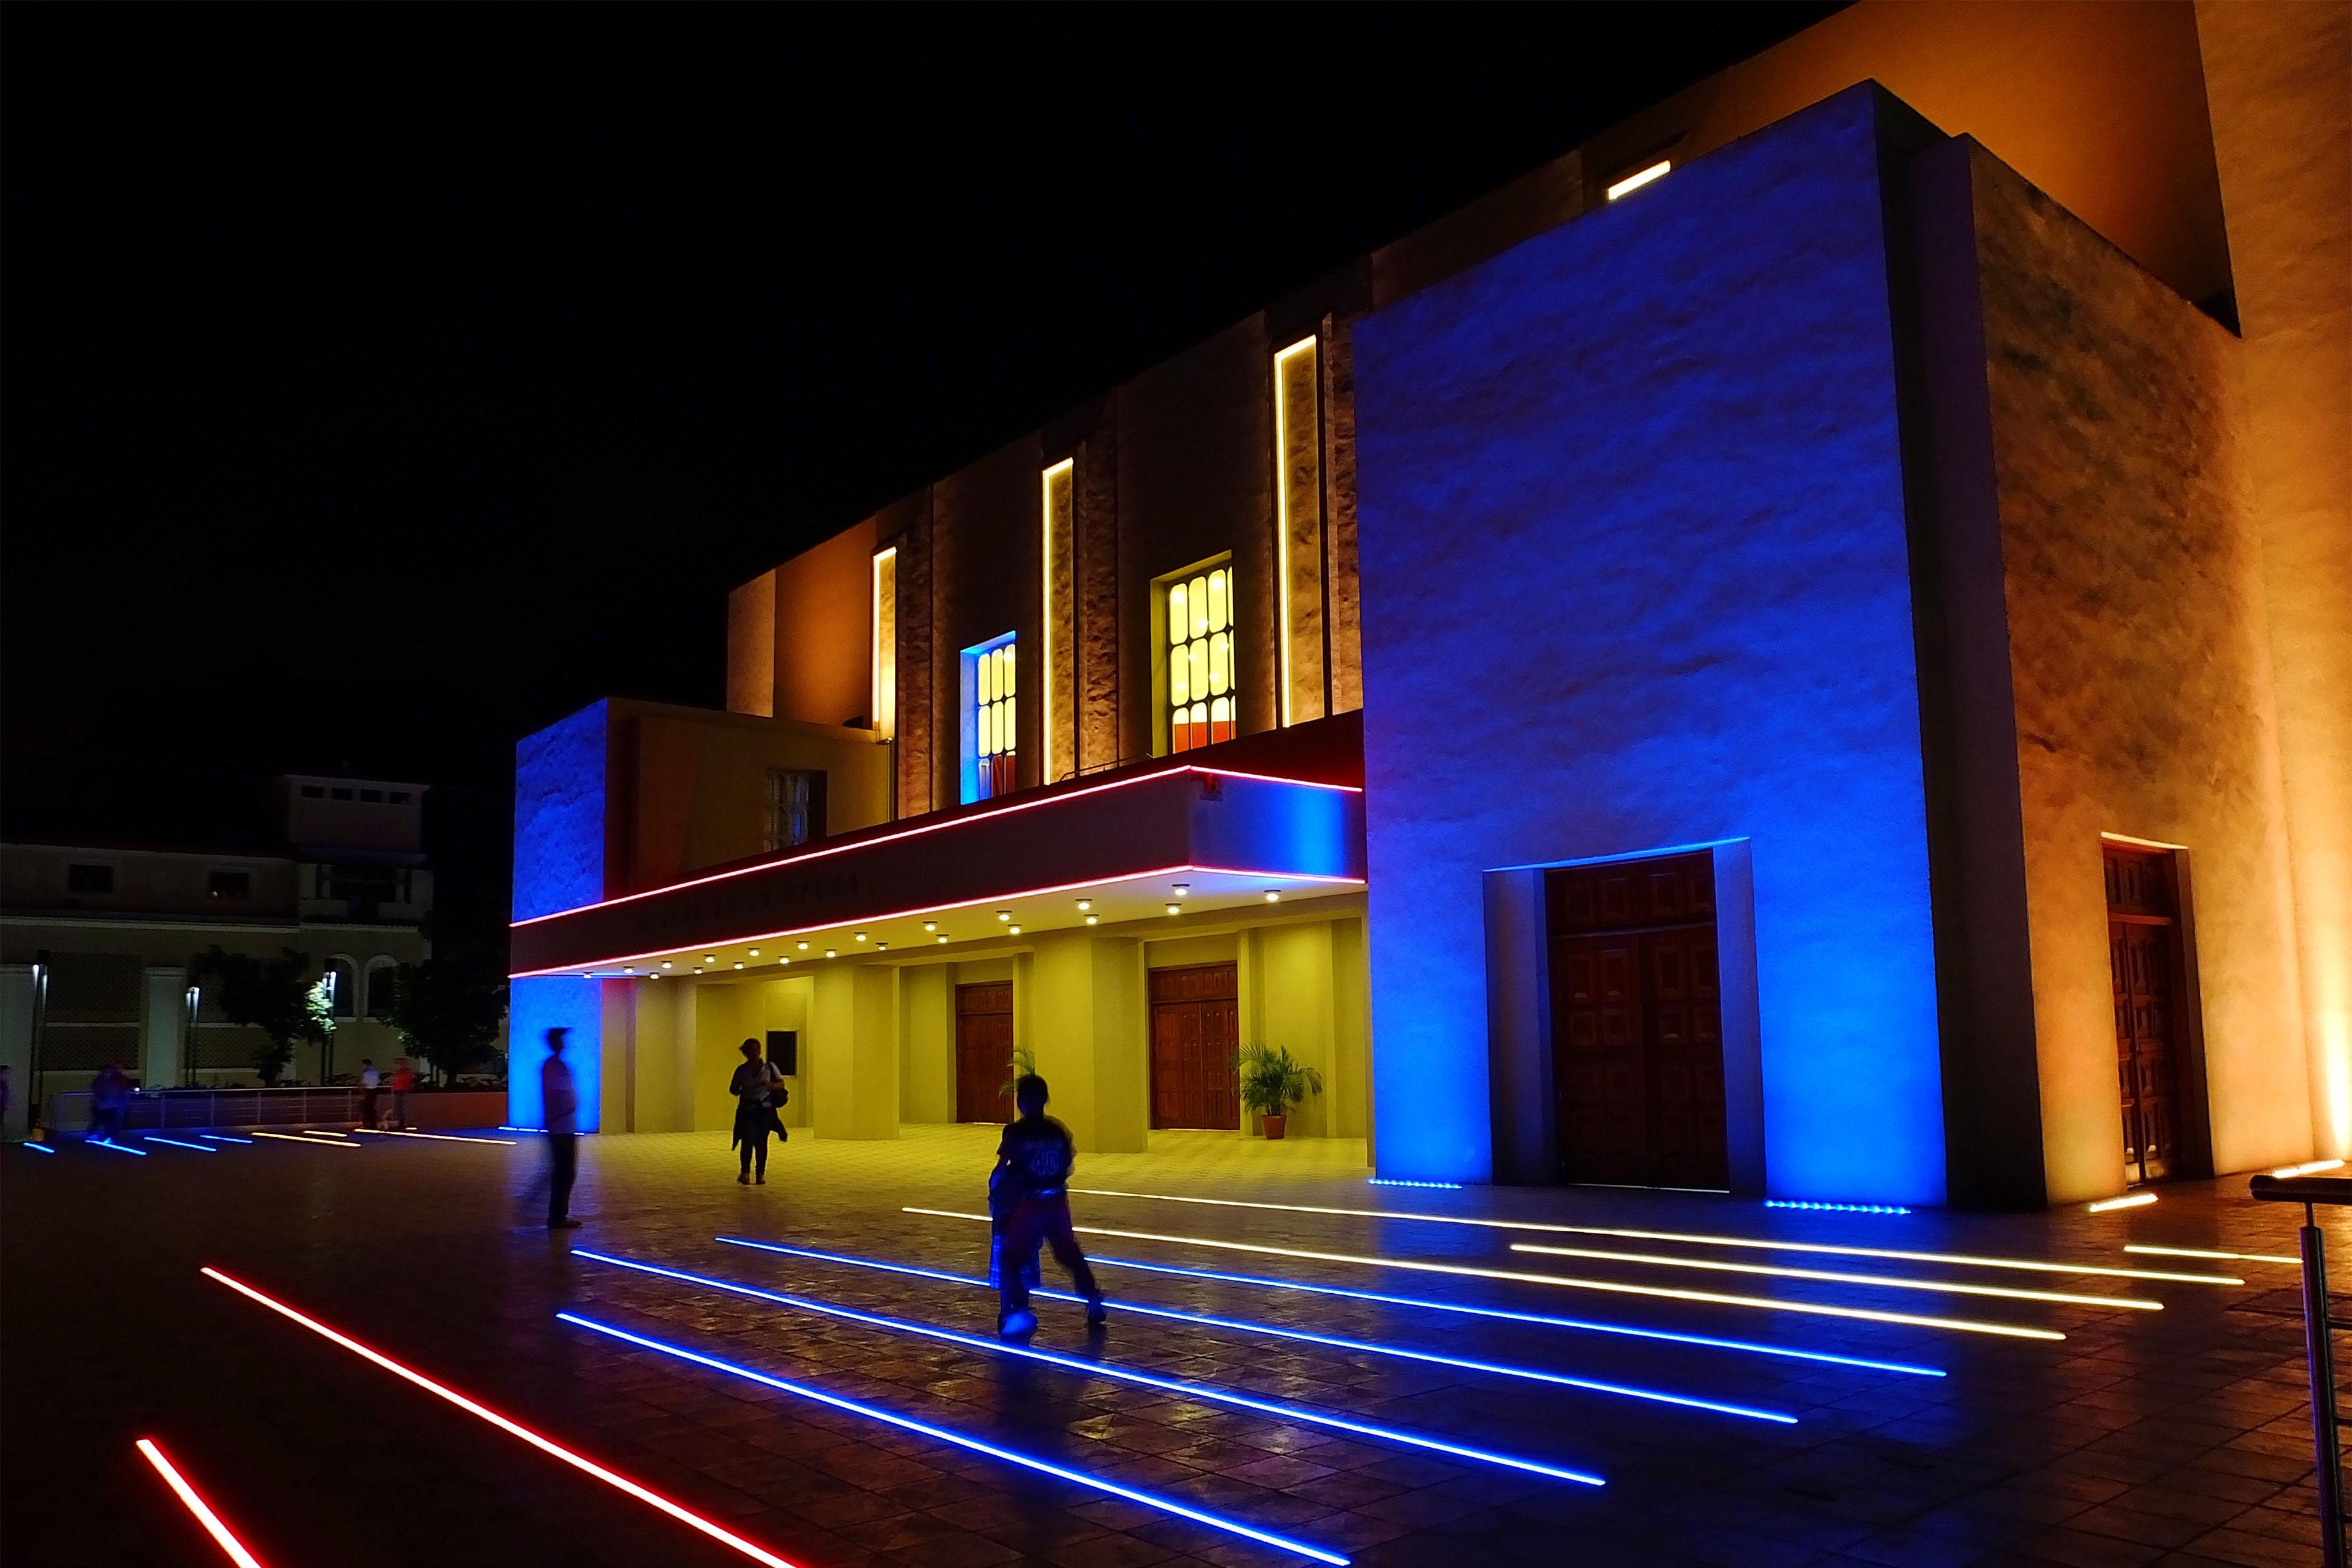 Entrada Teatro de la Ópera de Maracay